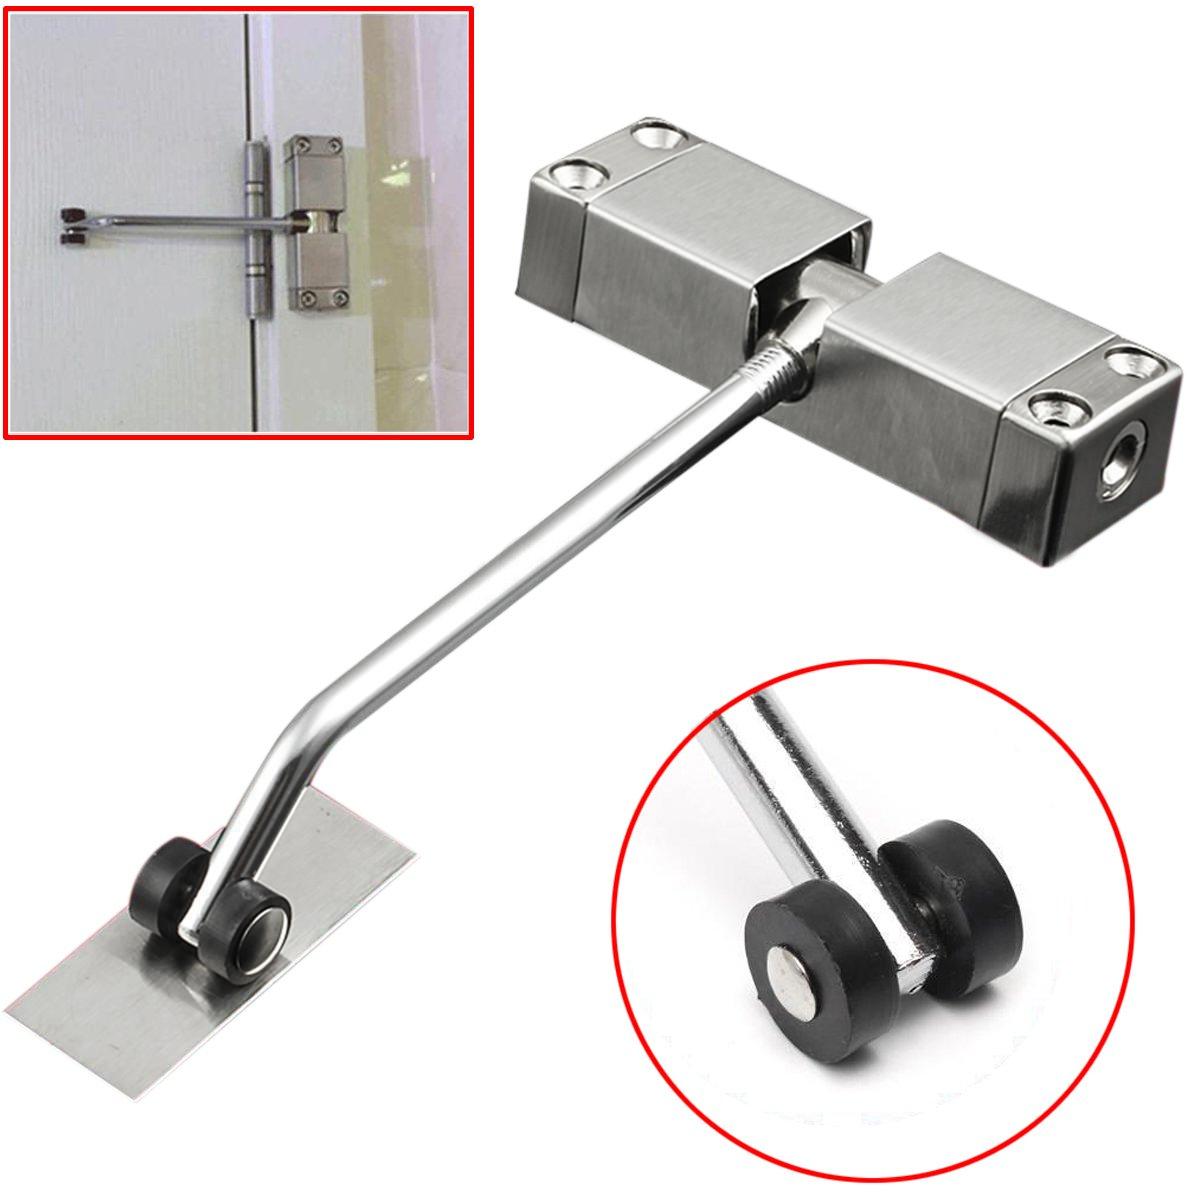 TOOGOO 1pc Automatic Mounted Spring Door Closer Stainless Steel Adjustable Surface Door Closer 160x96x20mm